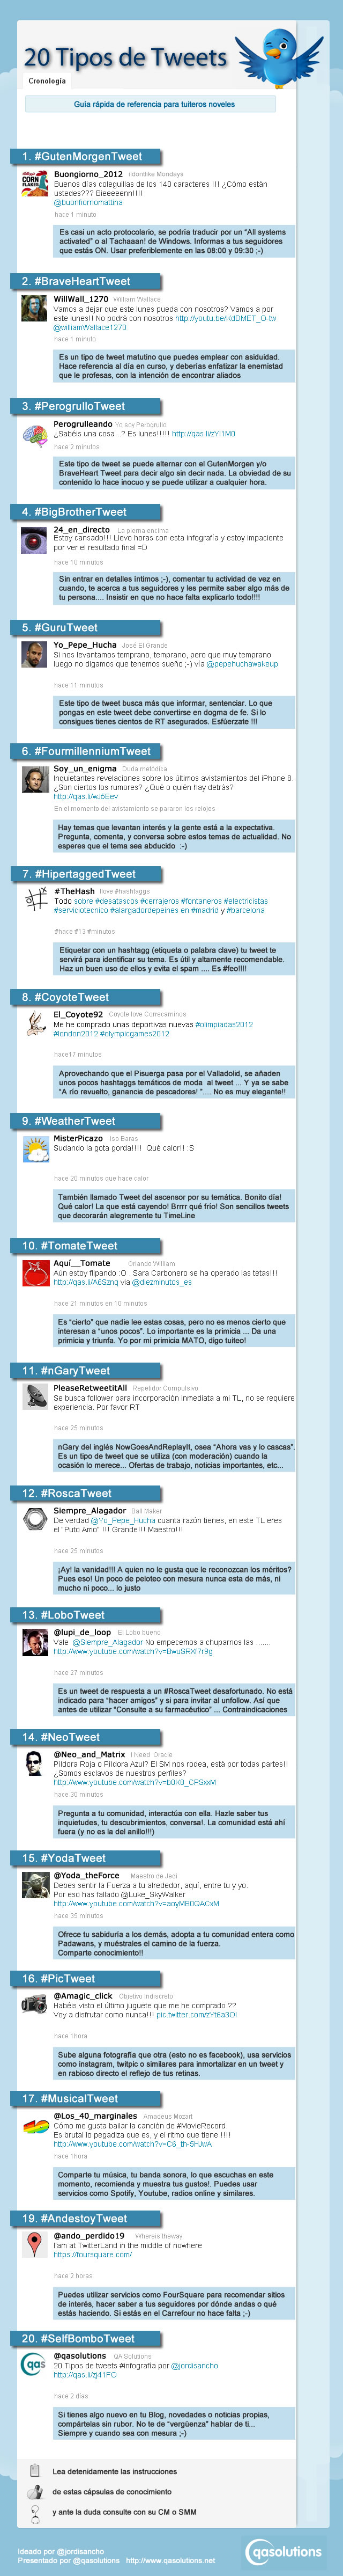 como usar twitter. 20 tipos de tweets